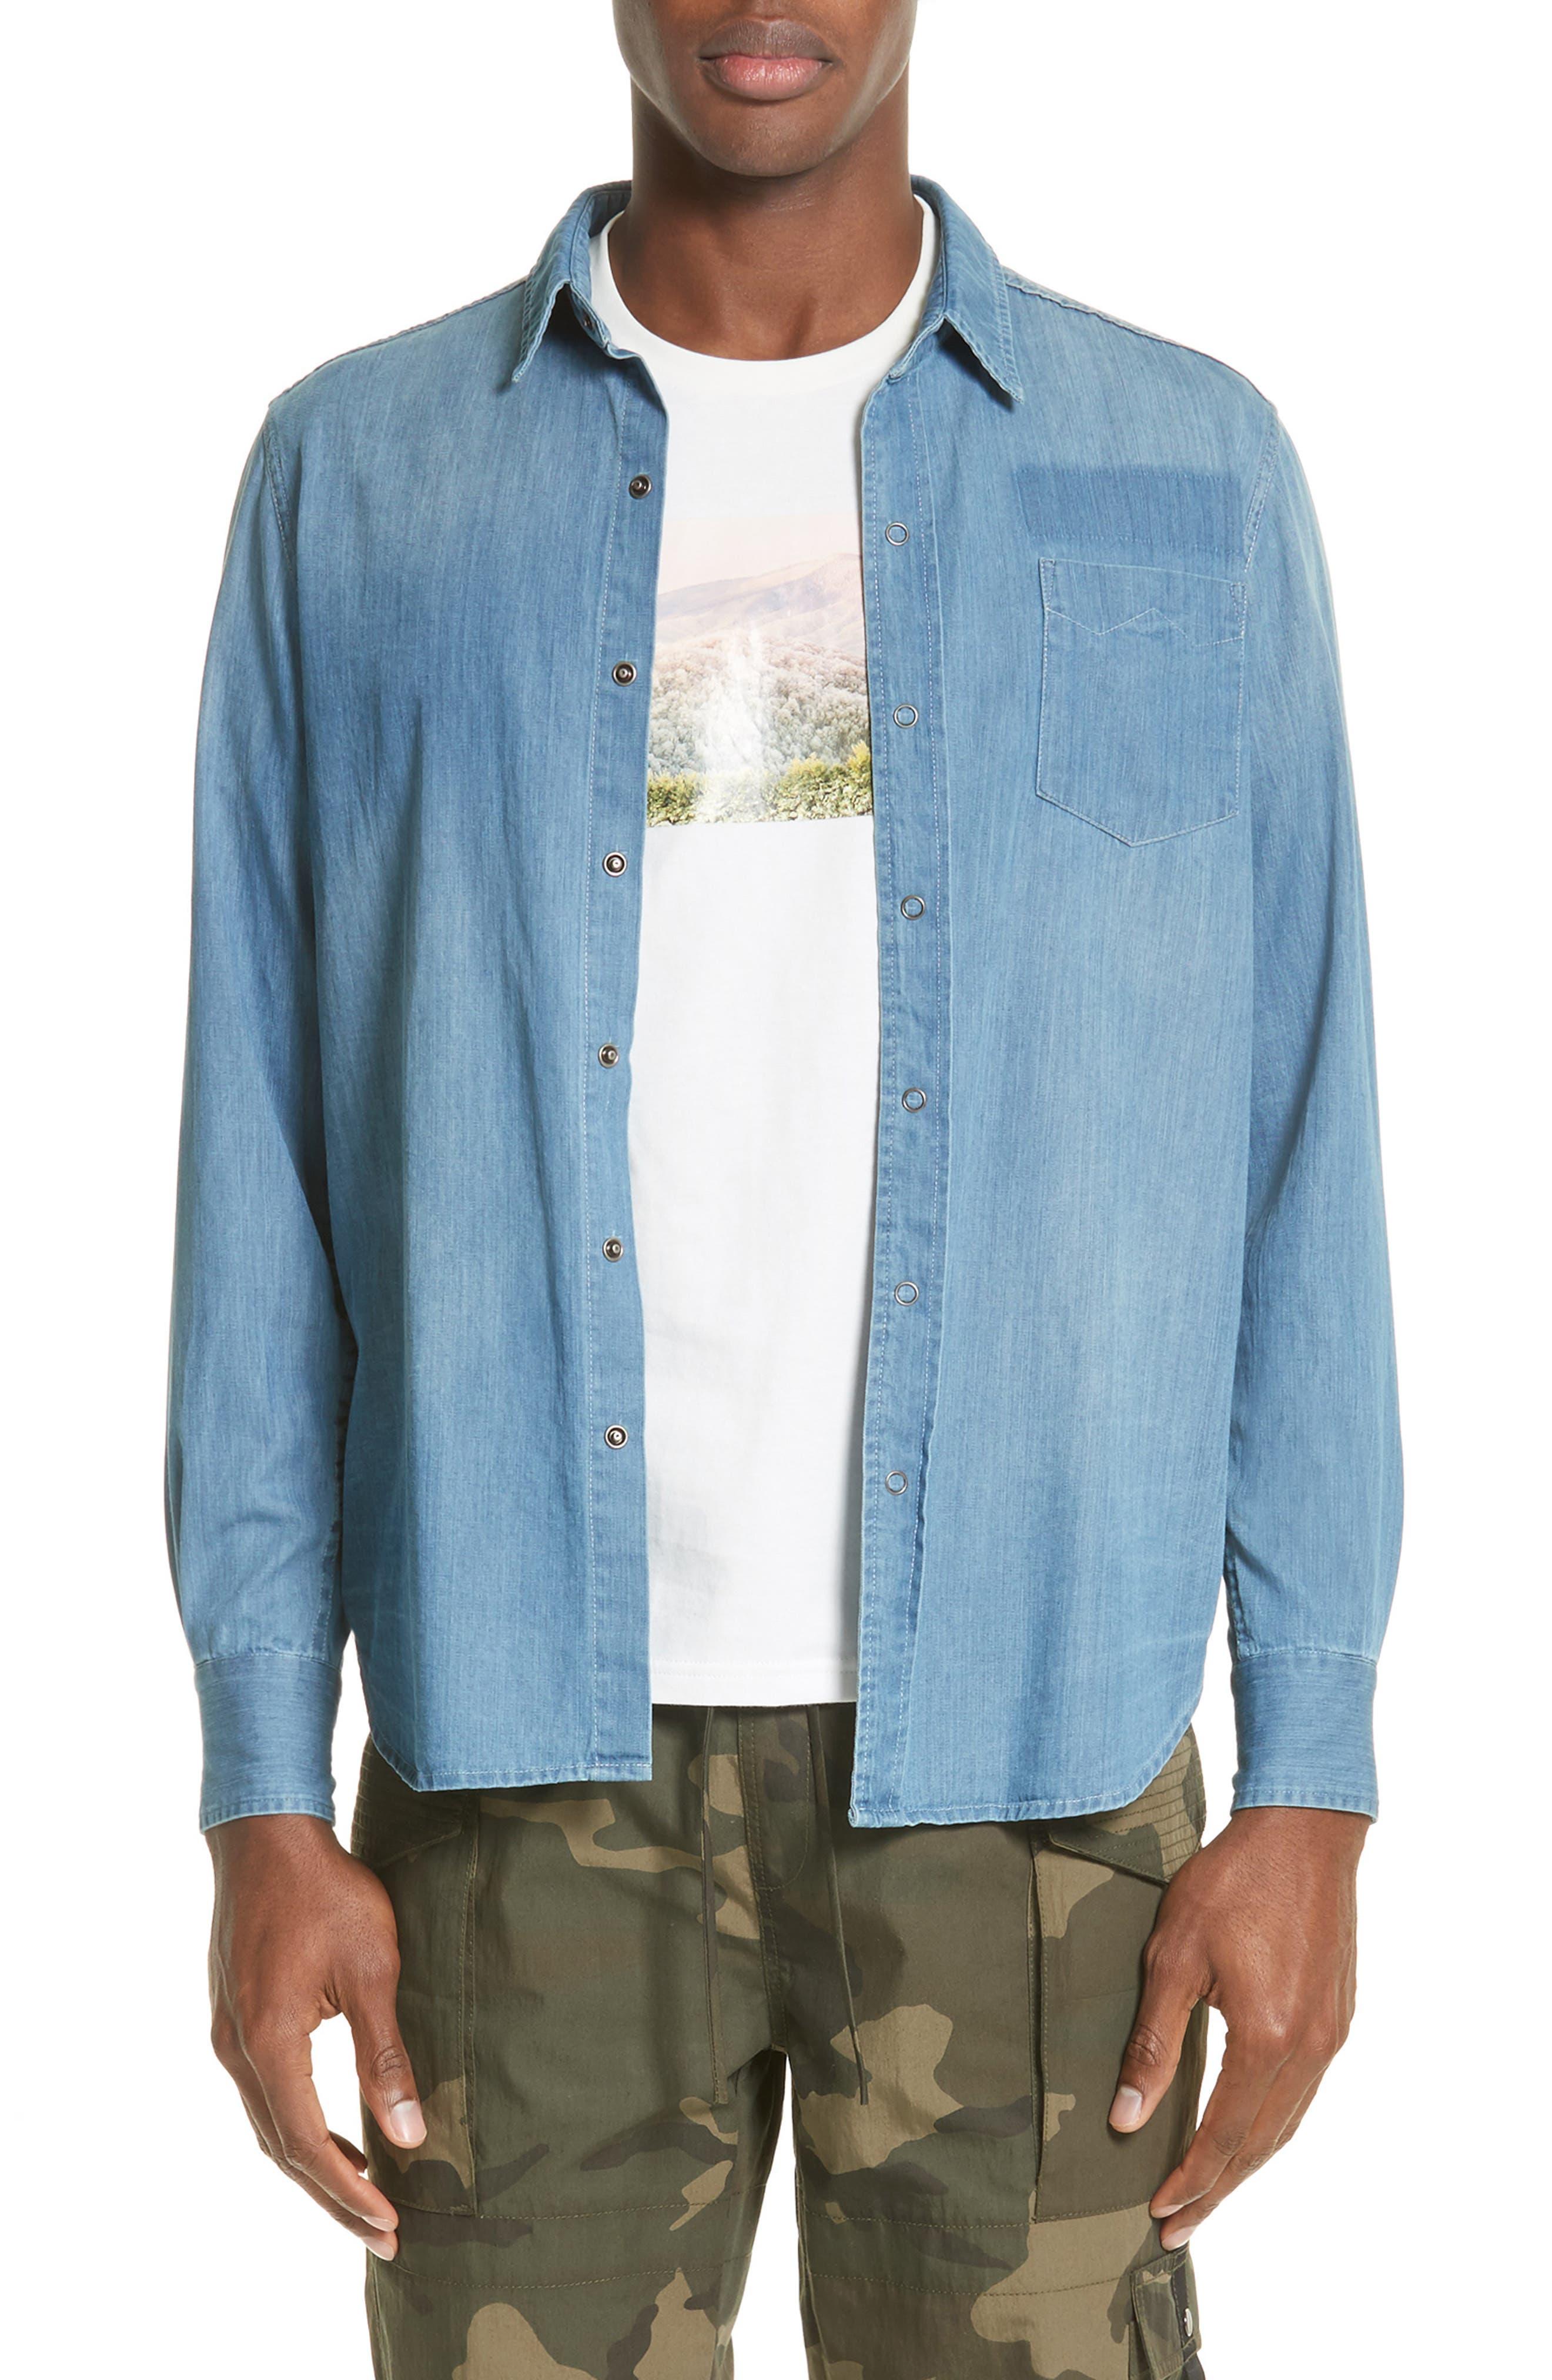 Alternate Image 1 Selected - OVADIA & SONS Eastern Denim Sport Shirt